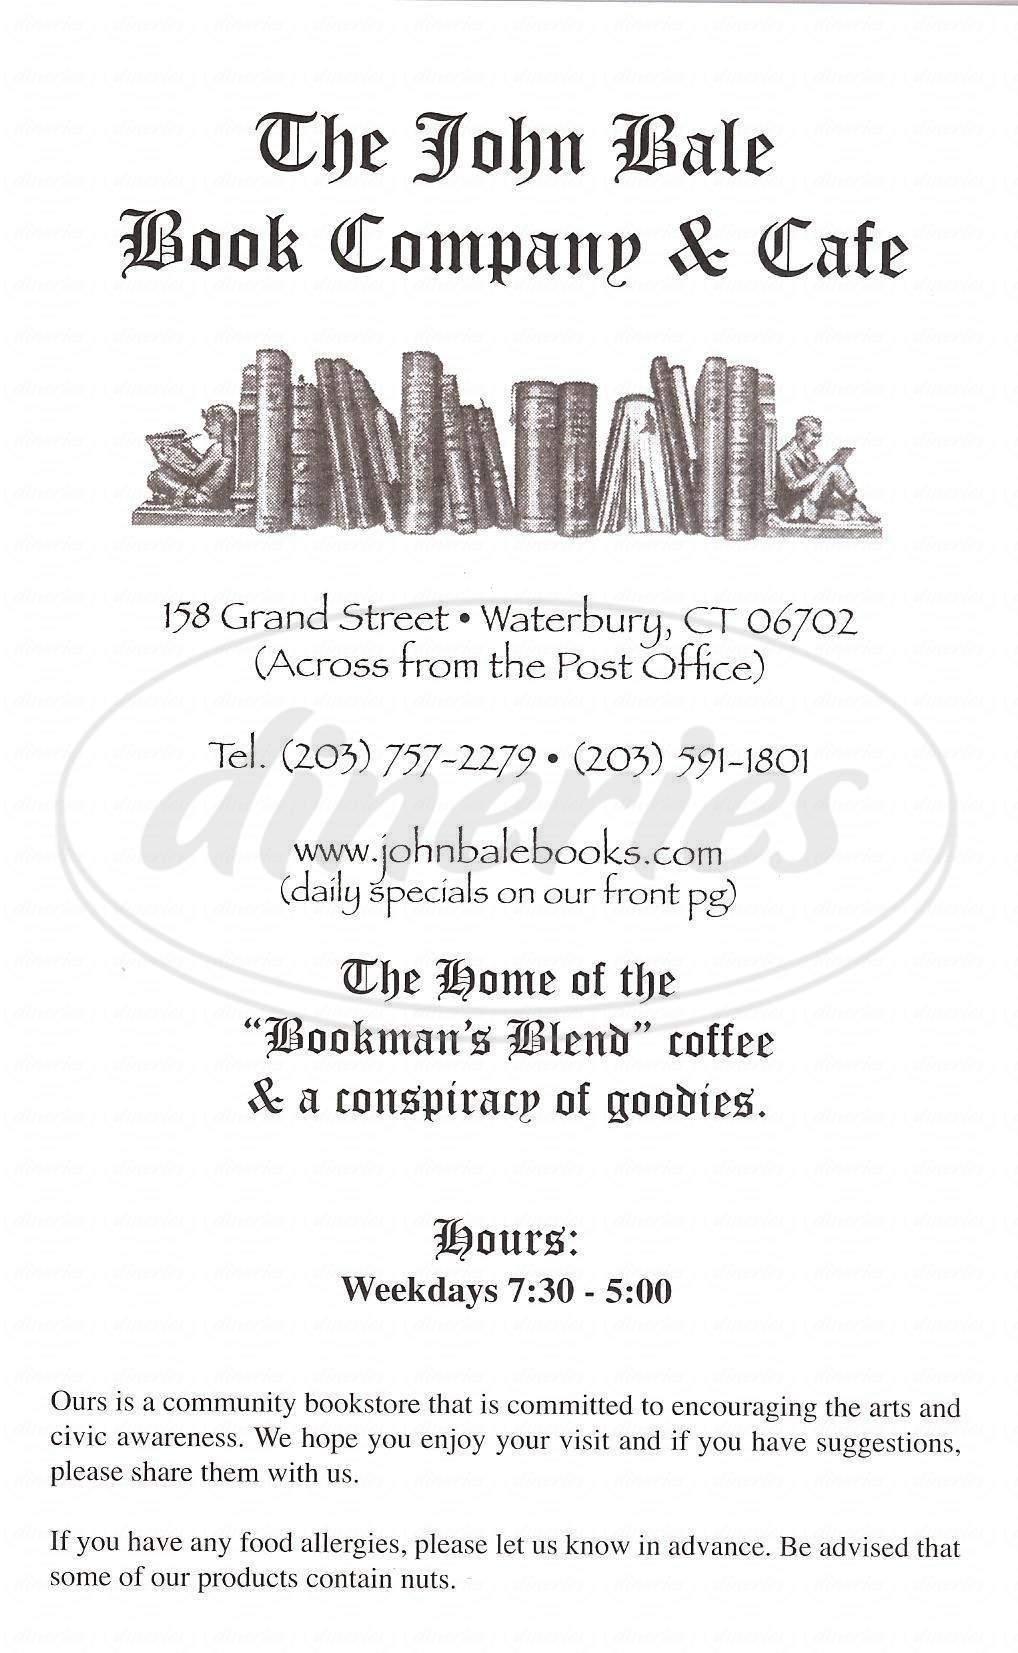 menu for The John Bale Book Company